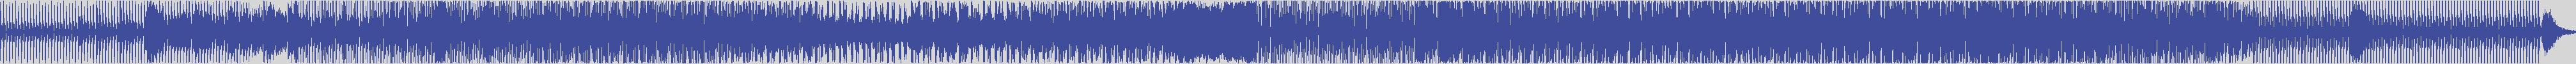 just_digital_records [smile1140] Southern Renx - Naraja [Original Mix] audio wave form